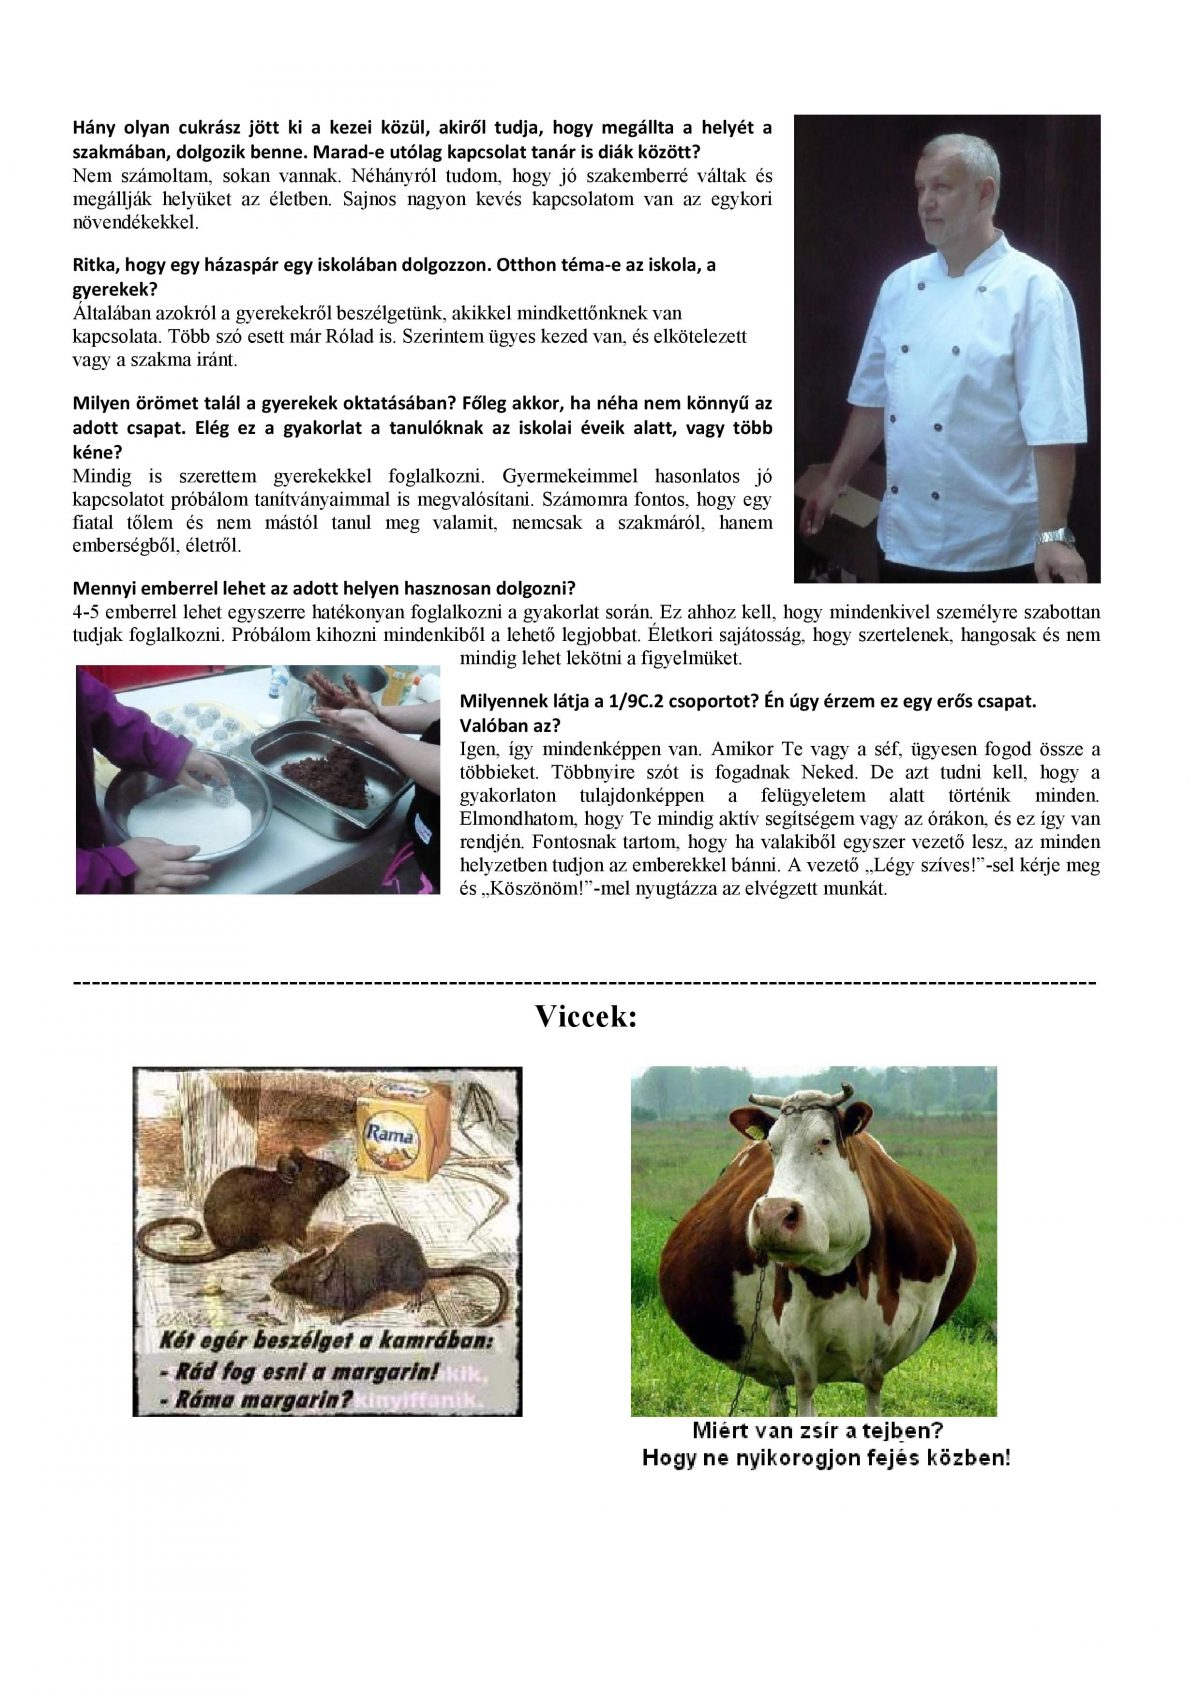 http://mandysuli.bkszc.hu/wp-content/uploads/2016/09/5.-oldal-page-002-1200x1697.jpg